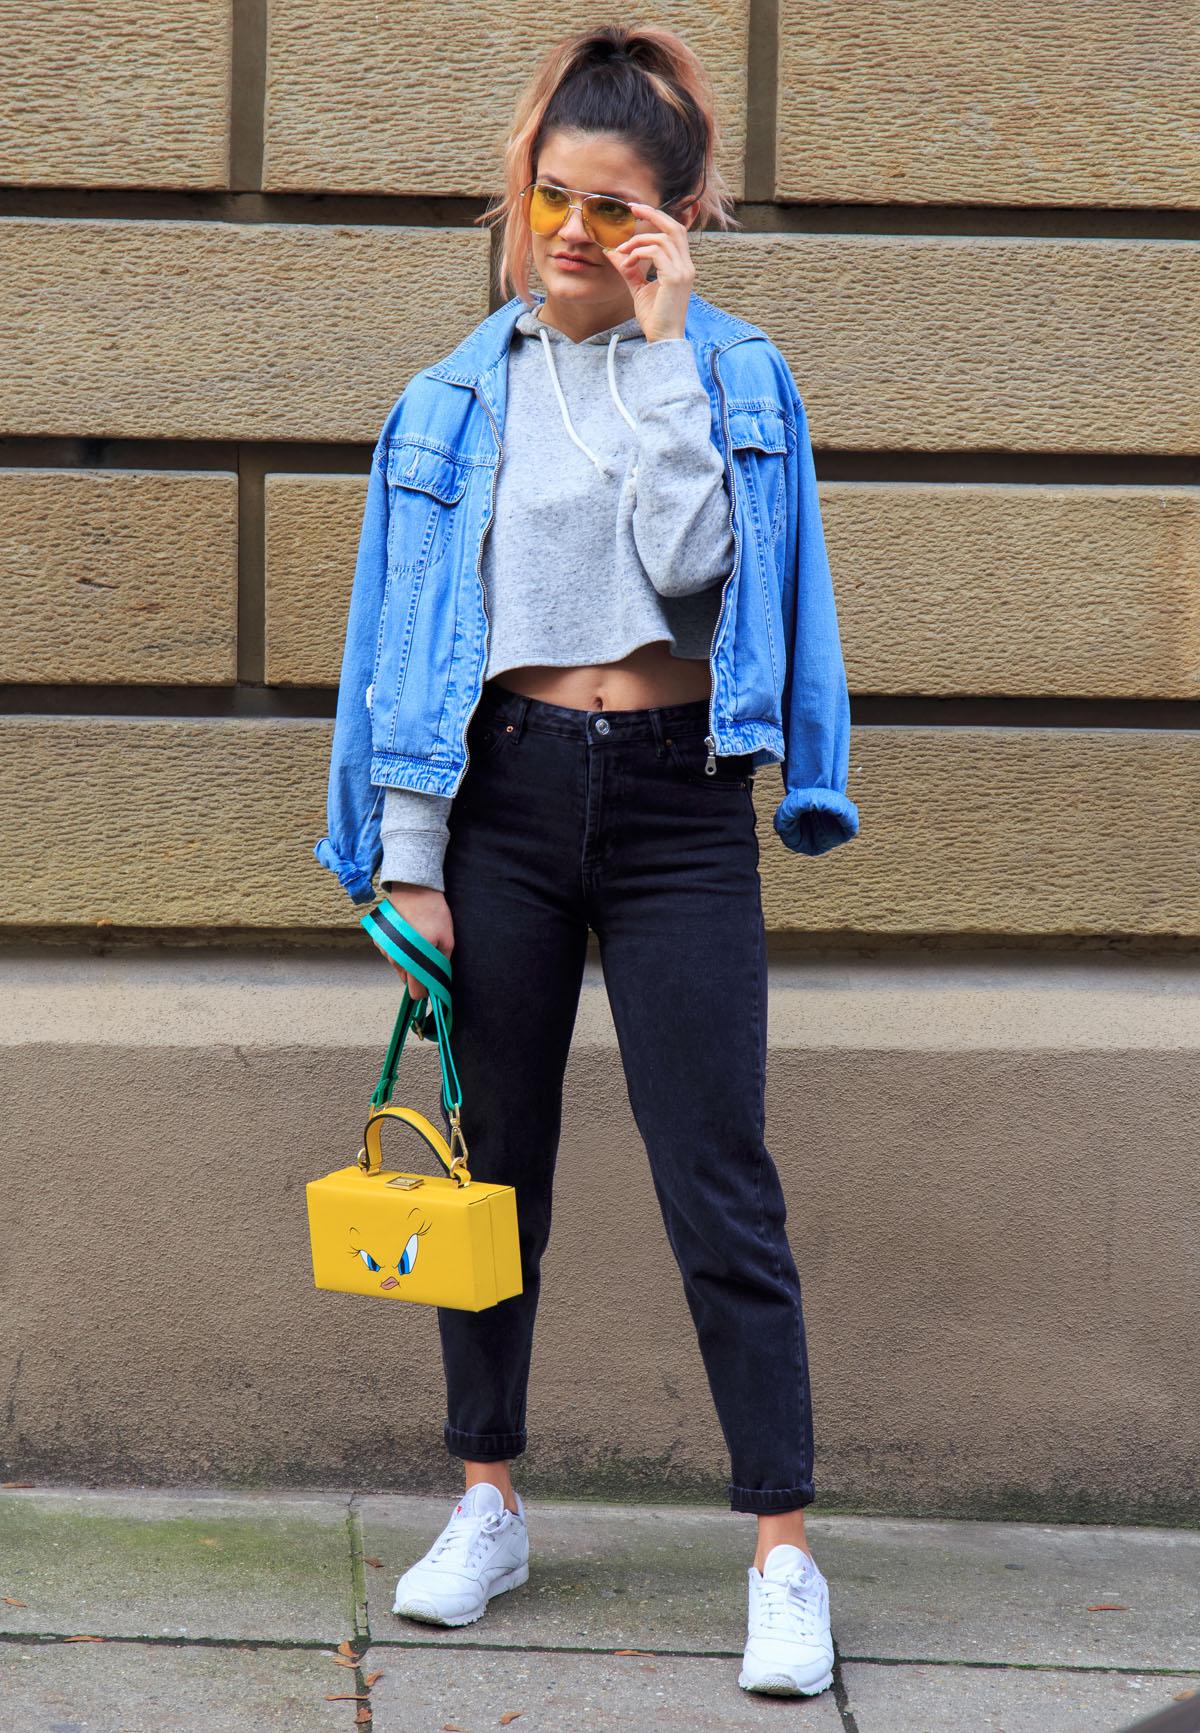 disney-purse-yellow-sunglasses-pastel-pink-hair-reebok-outfit